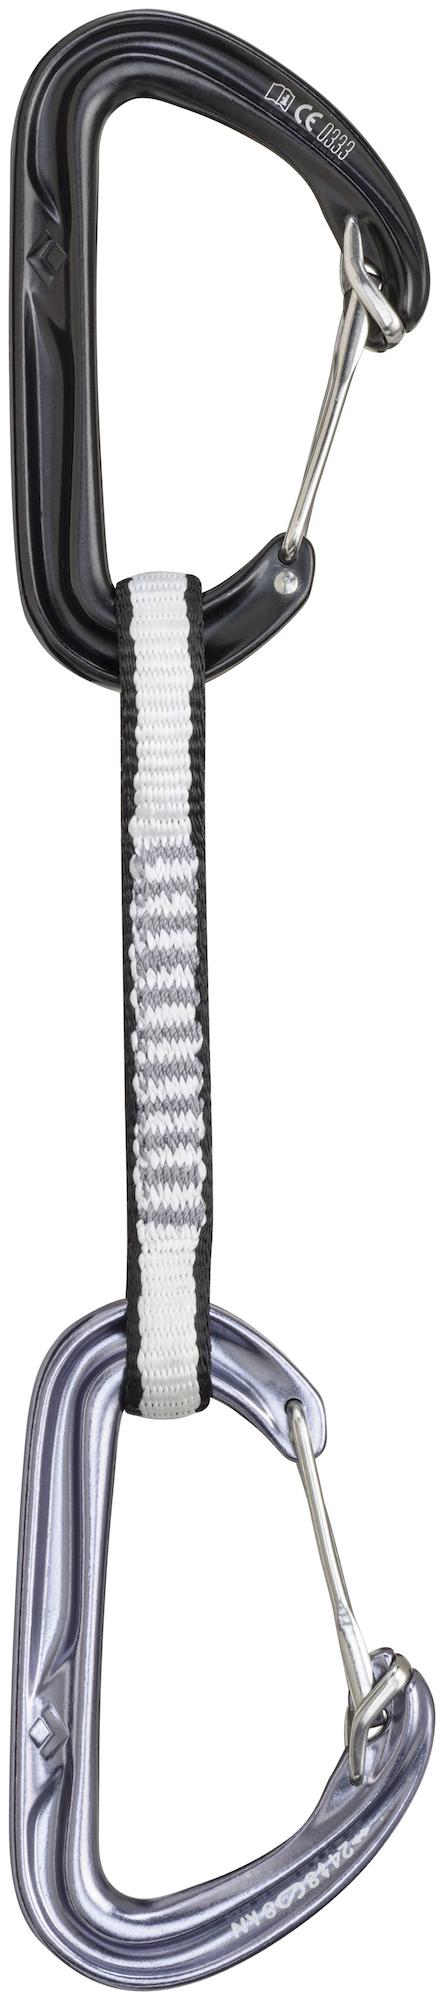 Black Diamond Hoodwire Quickdraw - 12 cm - Express-Set